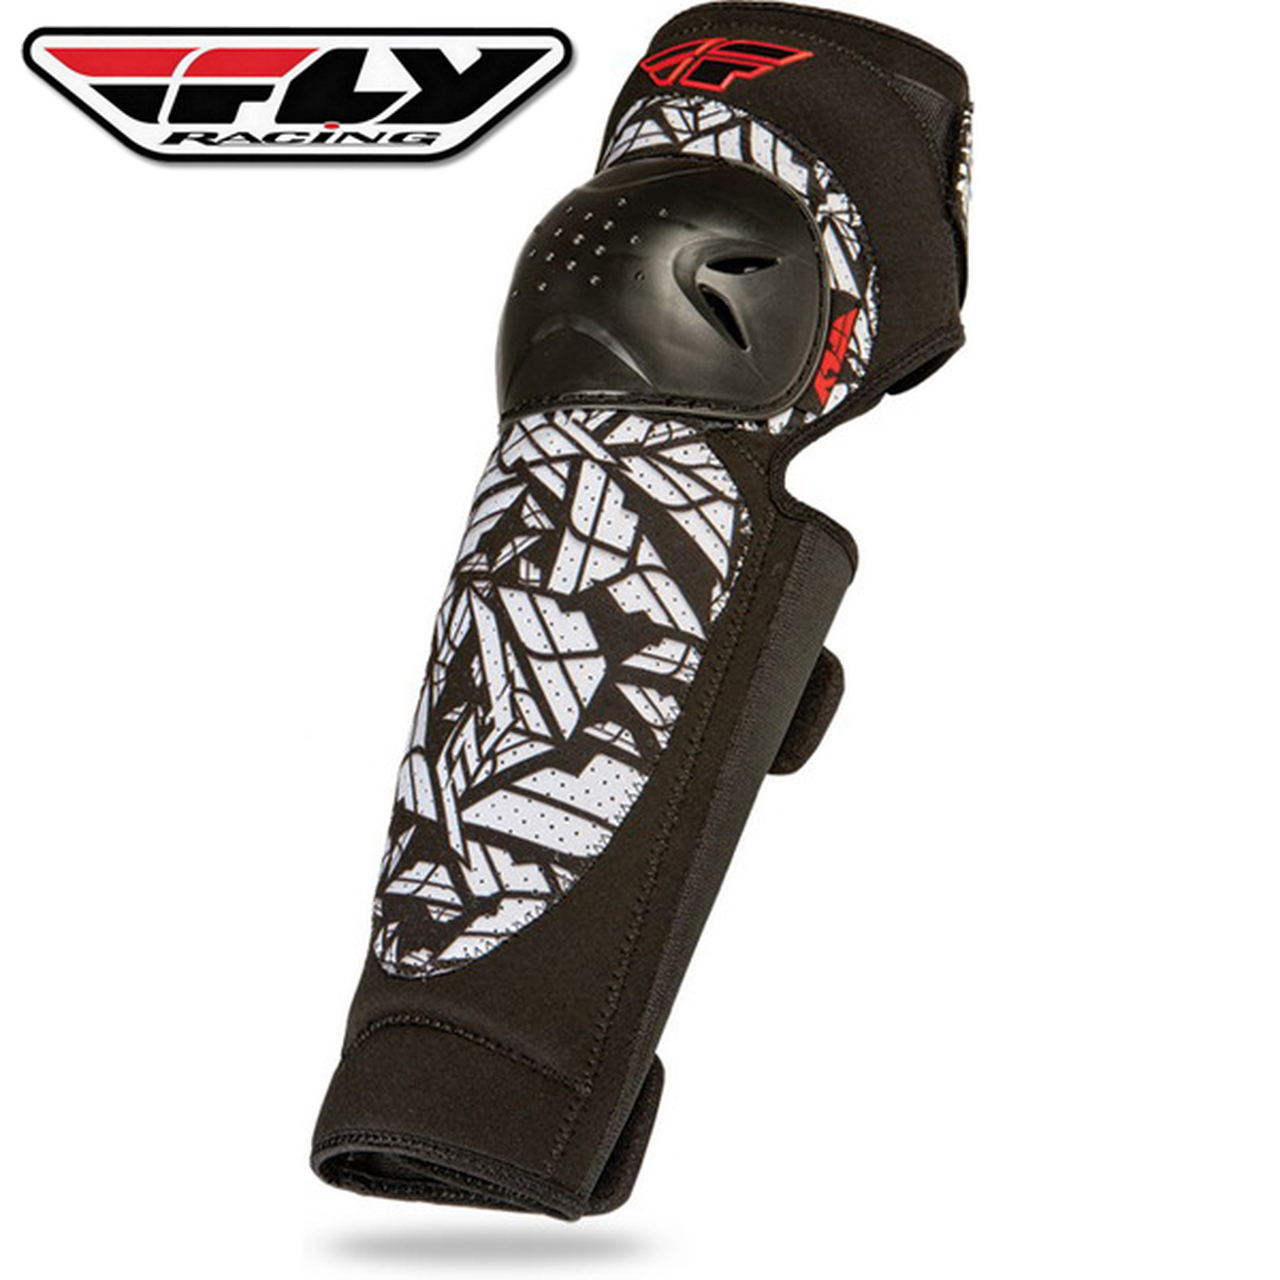 Fly Racing 2020 Barricade Flex Elbow Guards Black